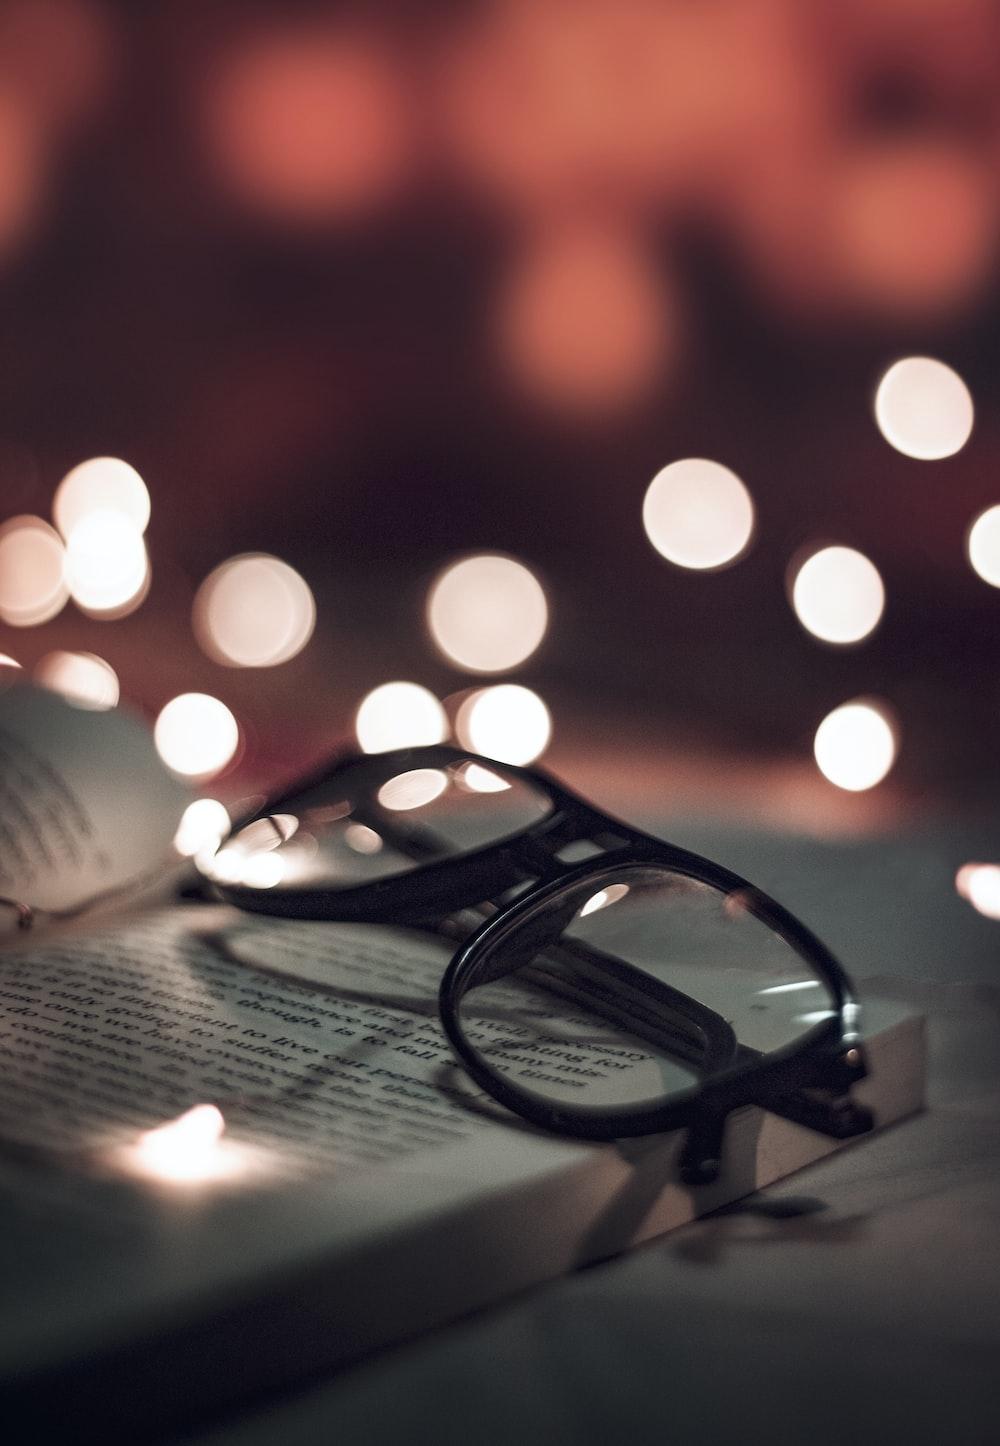 selective photo of black-framed eyeglasses on opened book